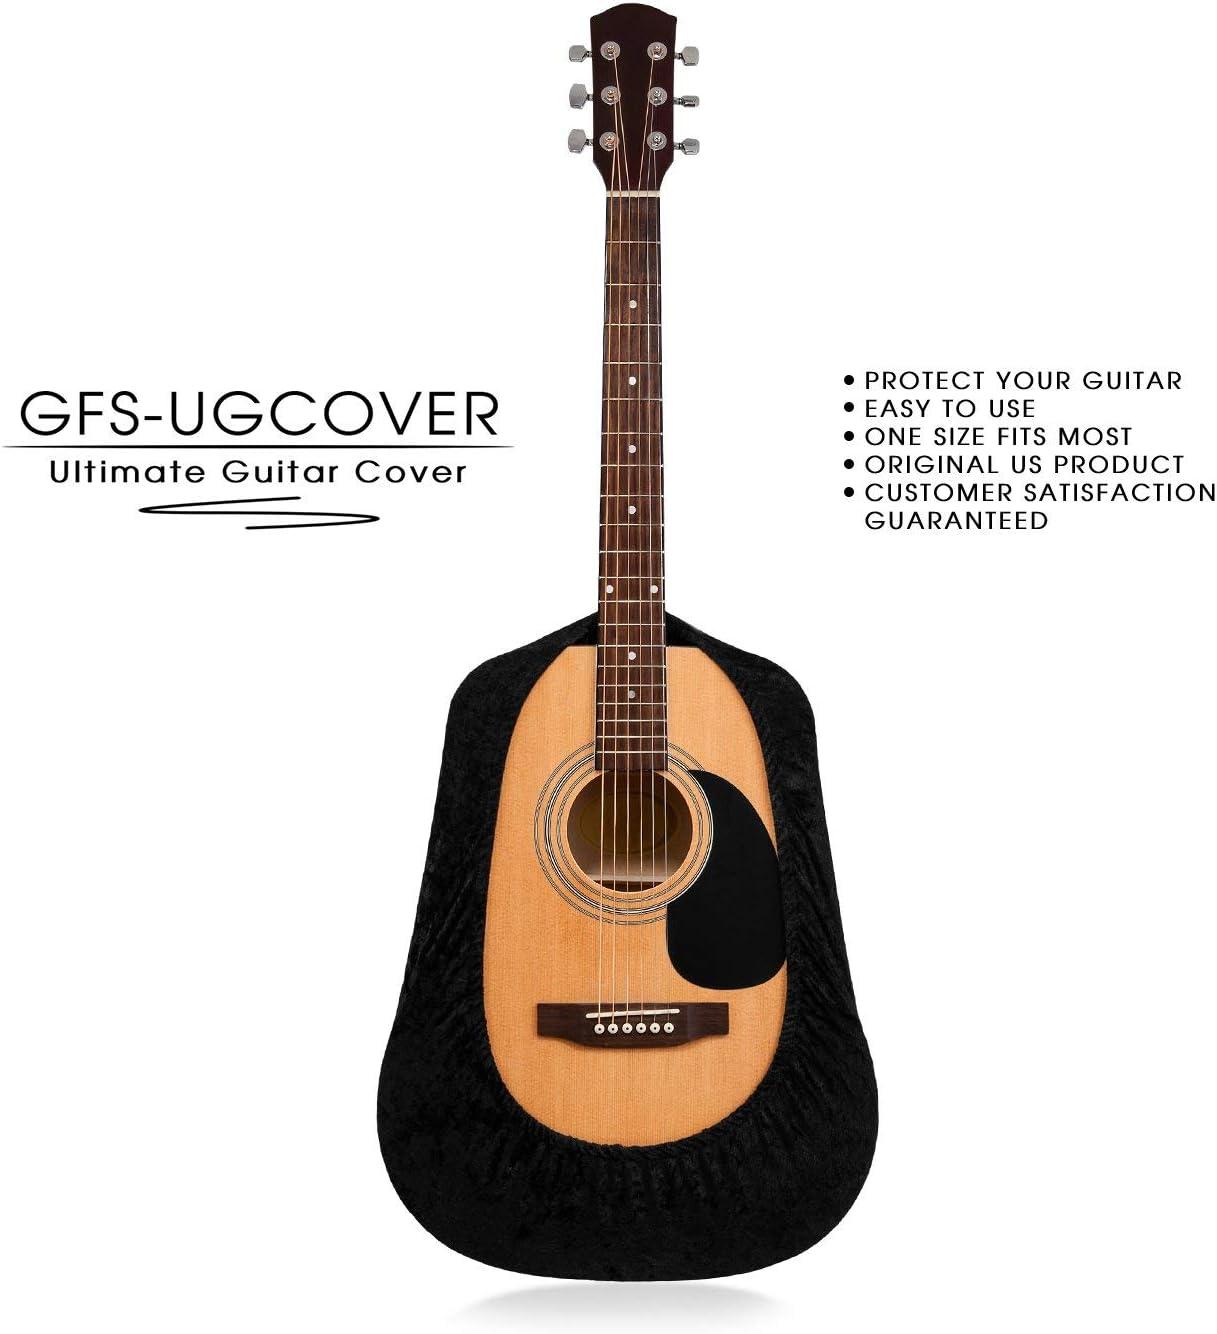 Bestlymood Protector de Guitarra, Funda de Guitarra, Funda ...